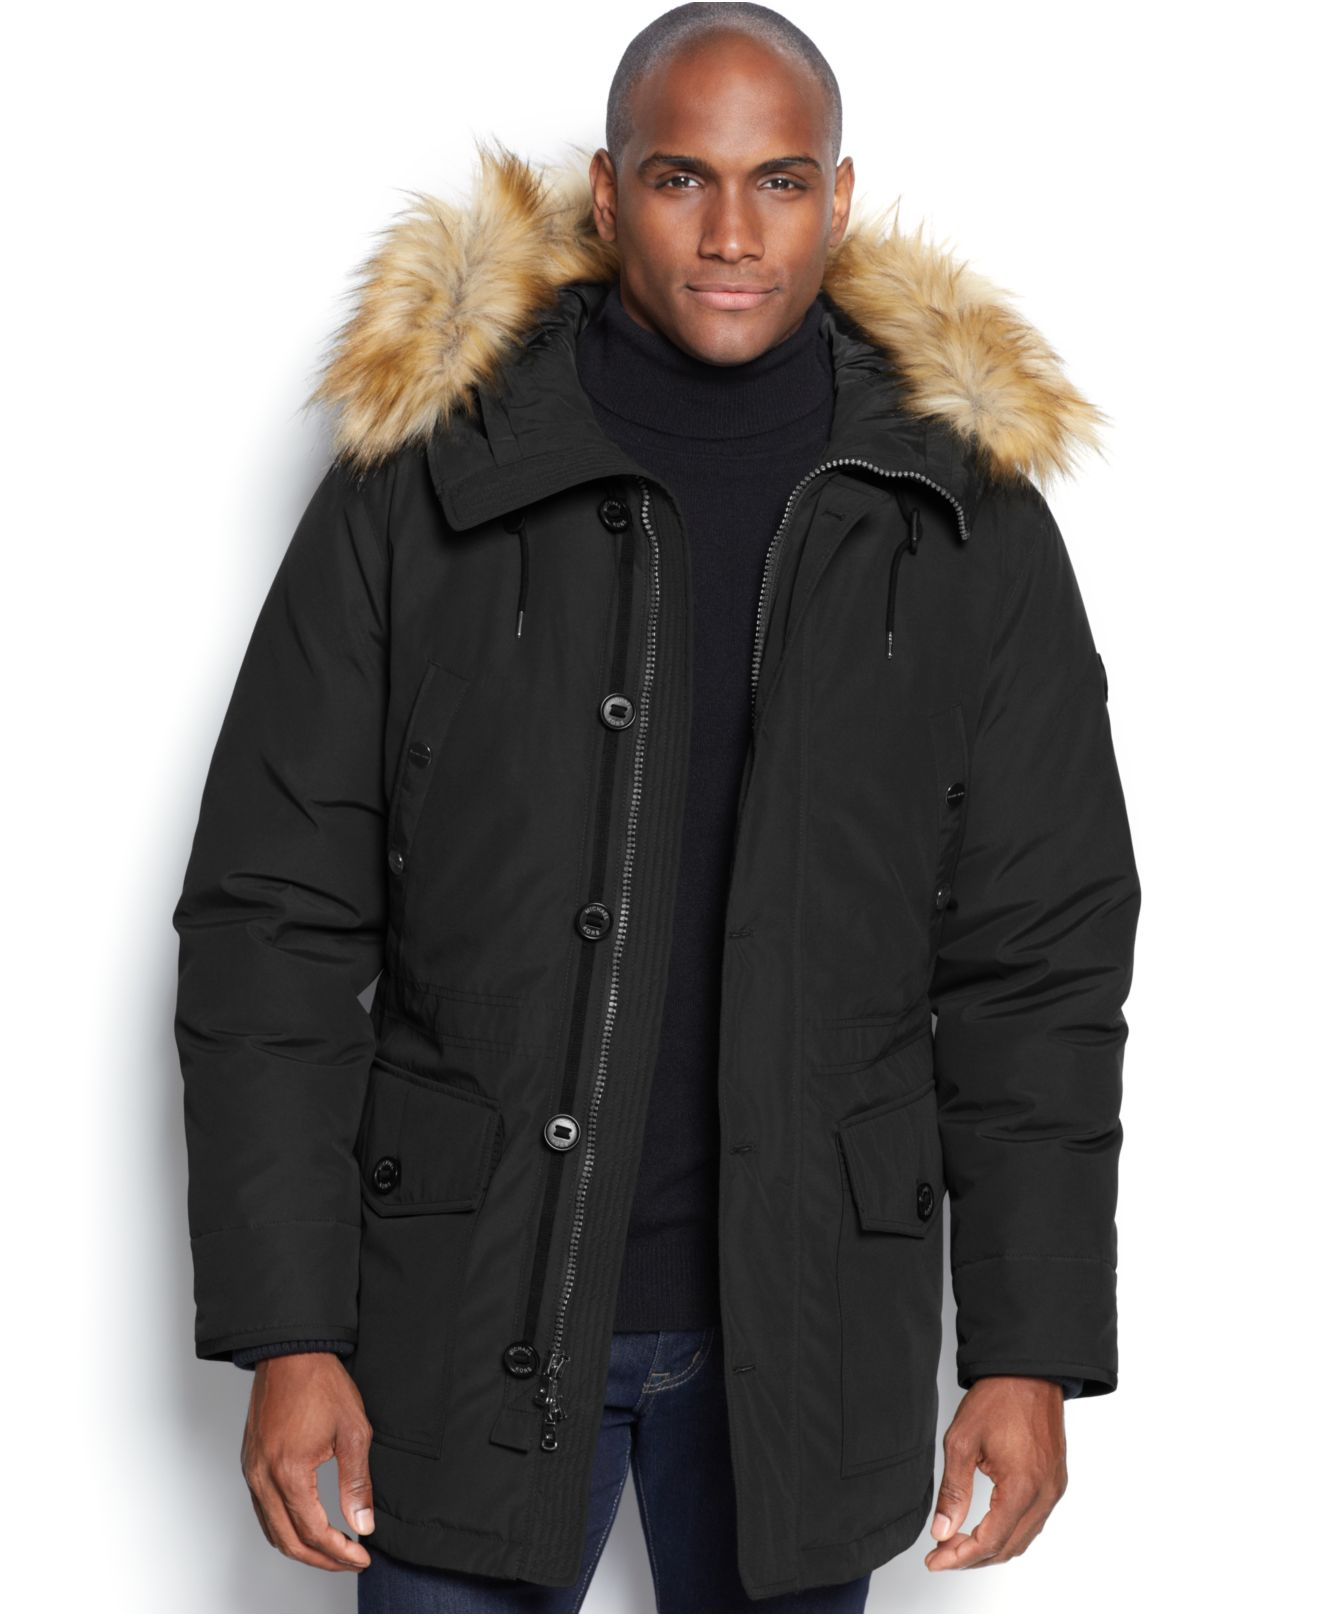 lyst michael kors michael mandal faux fur trim hooded down parka in black for men. Black Bedroom Furniture Sets. Home Design Ideas